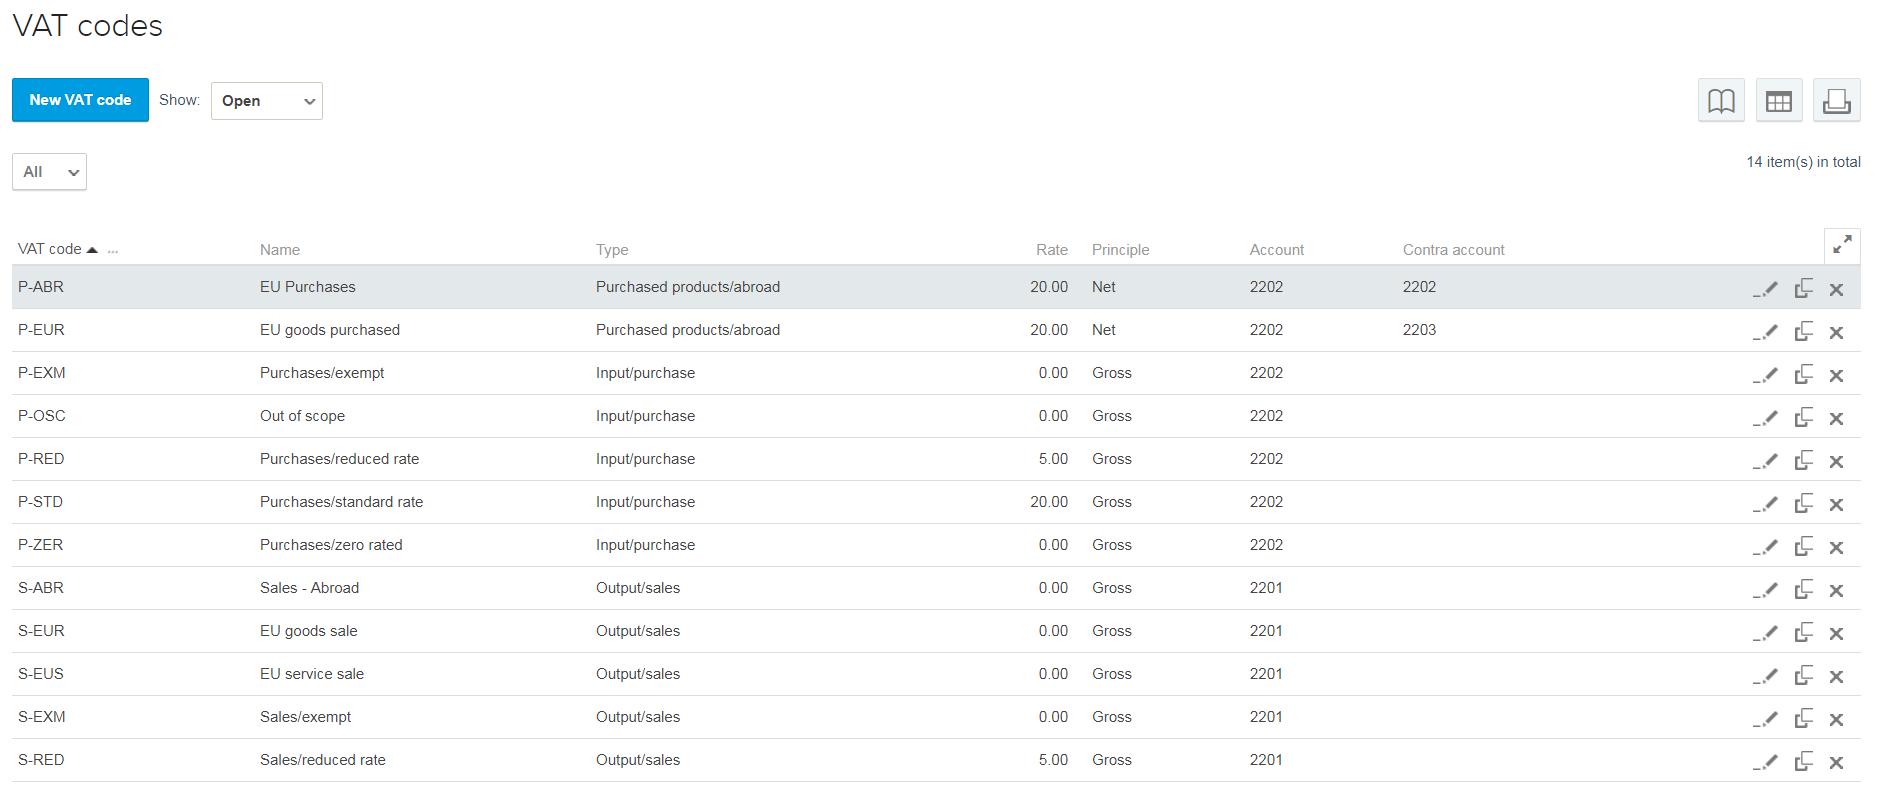 VAT codes screenshot